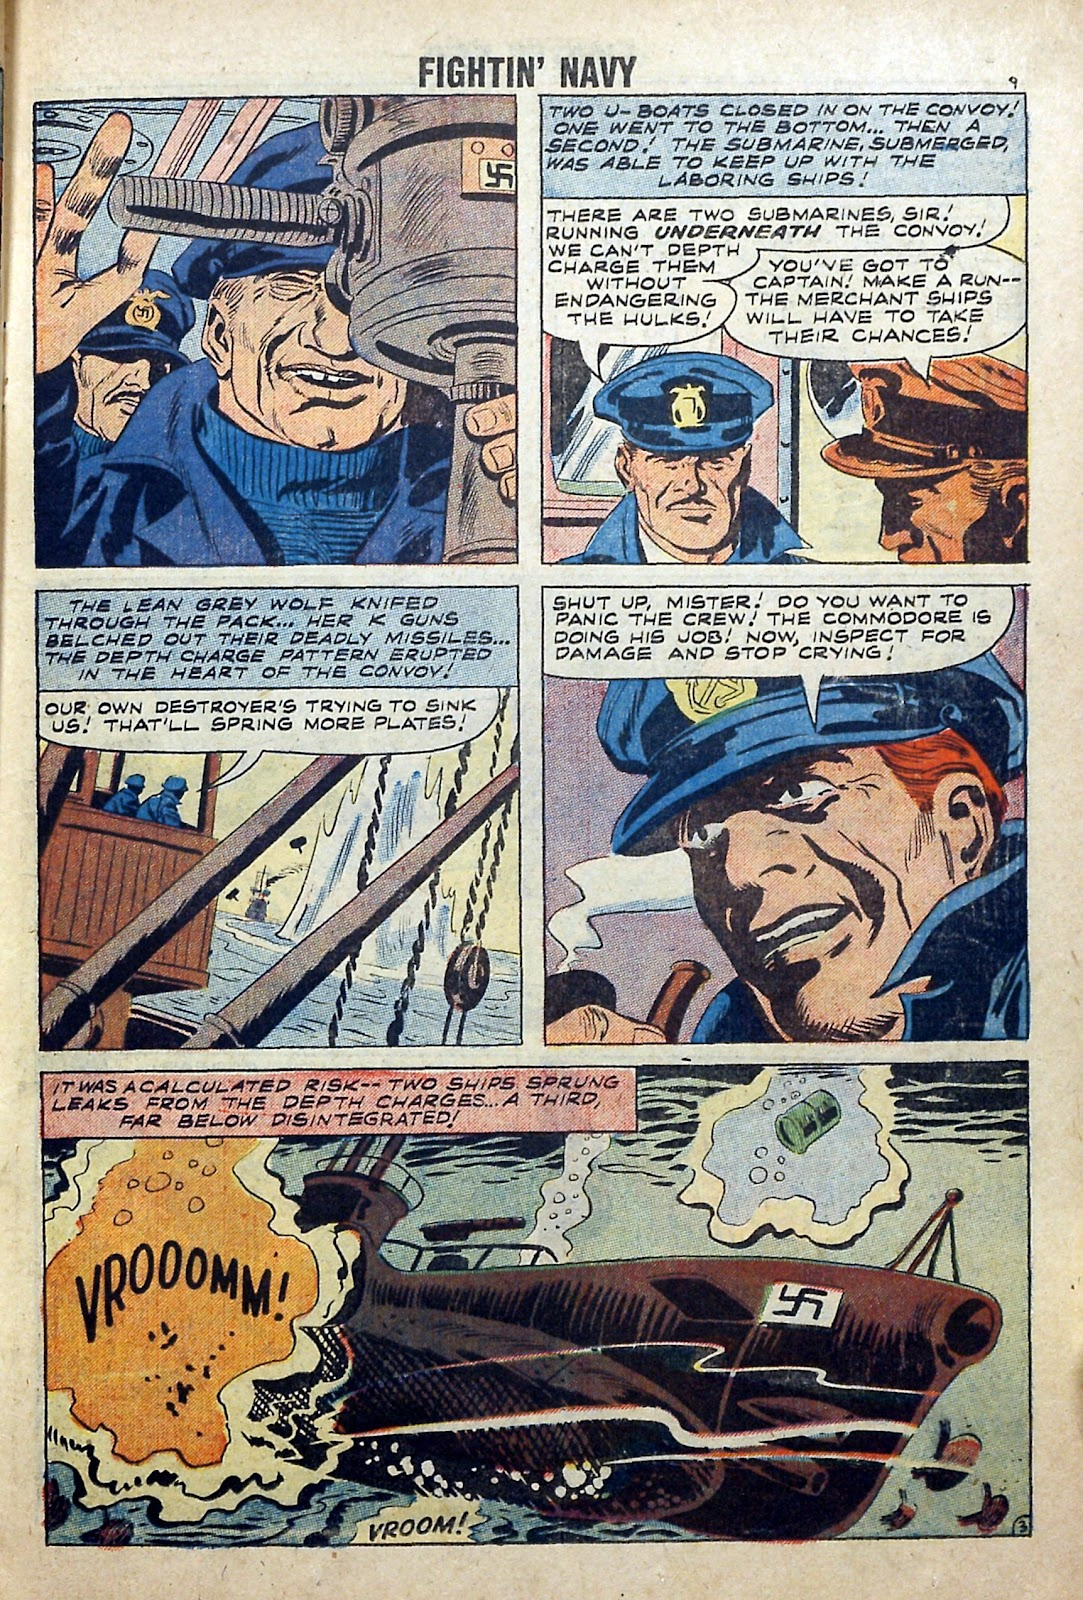 Read online Fightin' Navy comic -  Issue #84 - 11